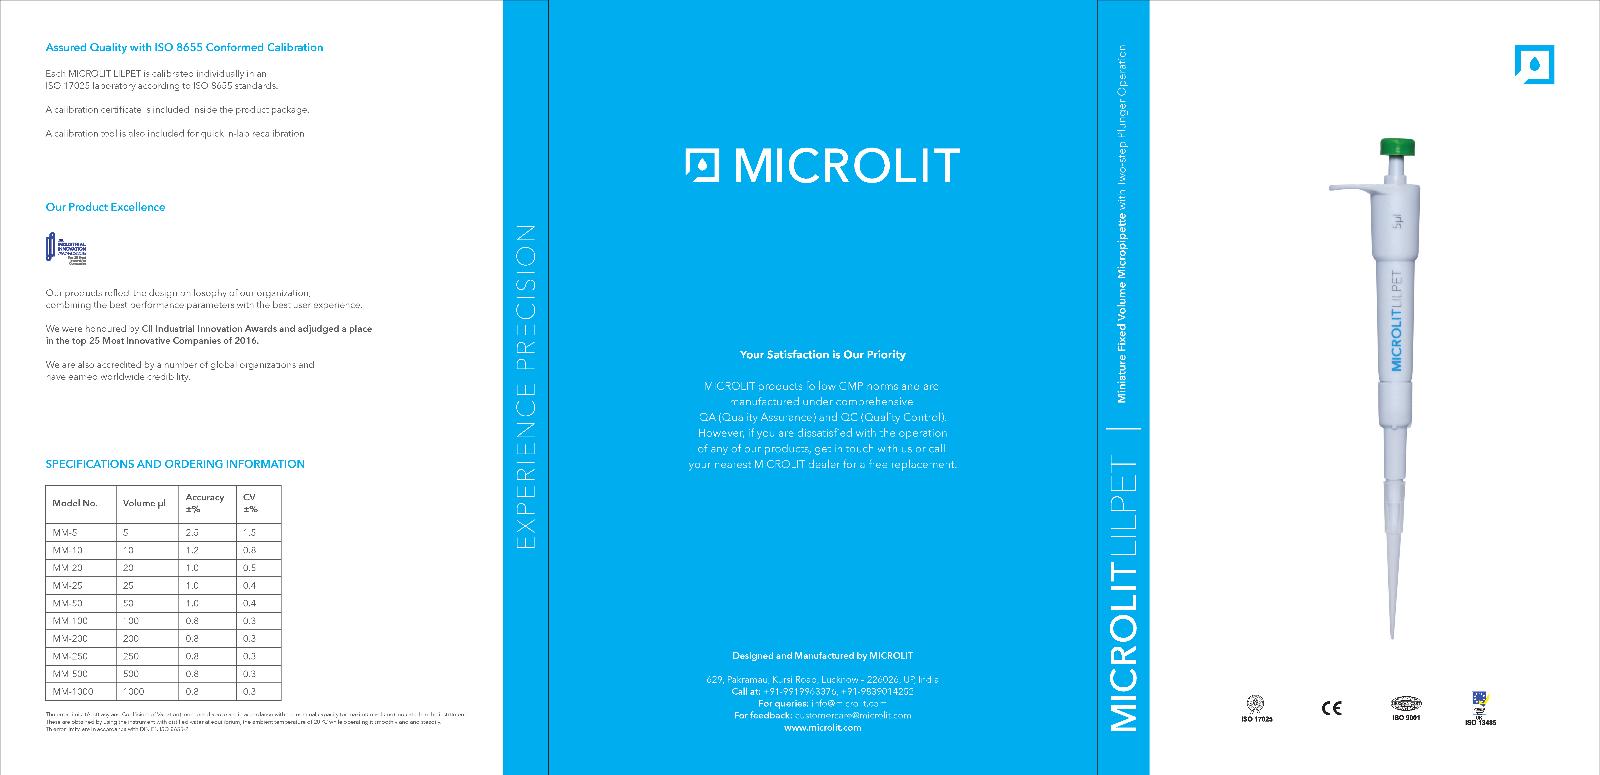 Micro Mini pipettor Fixed Volume Fully Autoclavable Li'lpet, 6 Sizes, 1 Pc/Pk 4